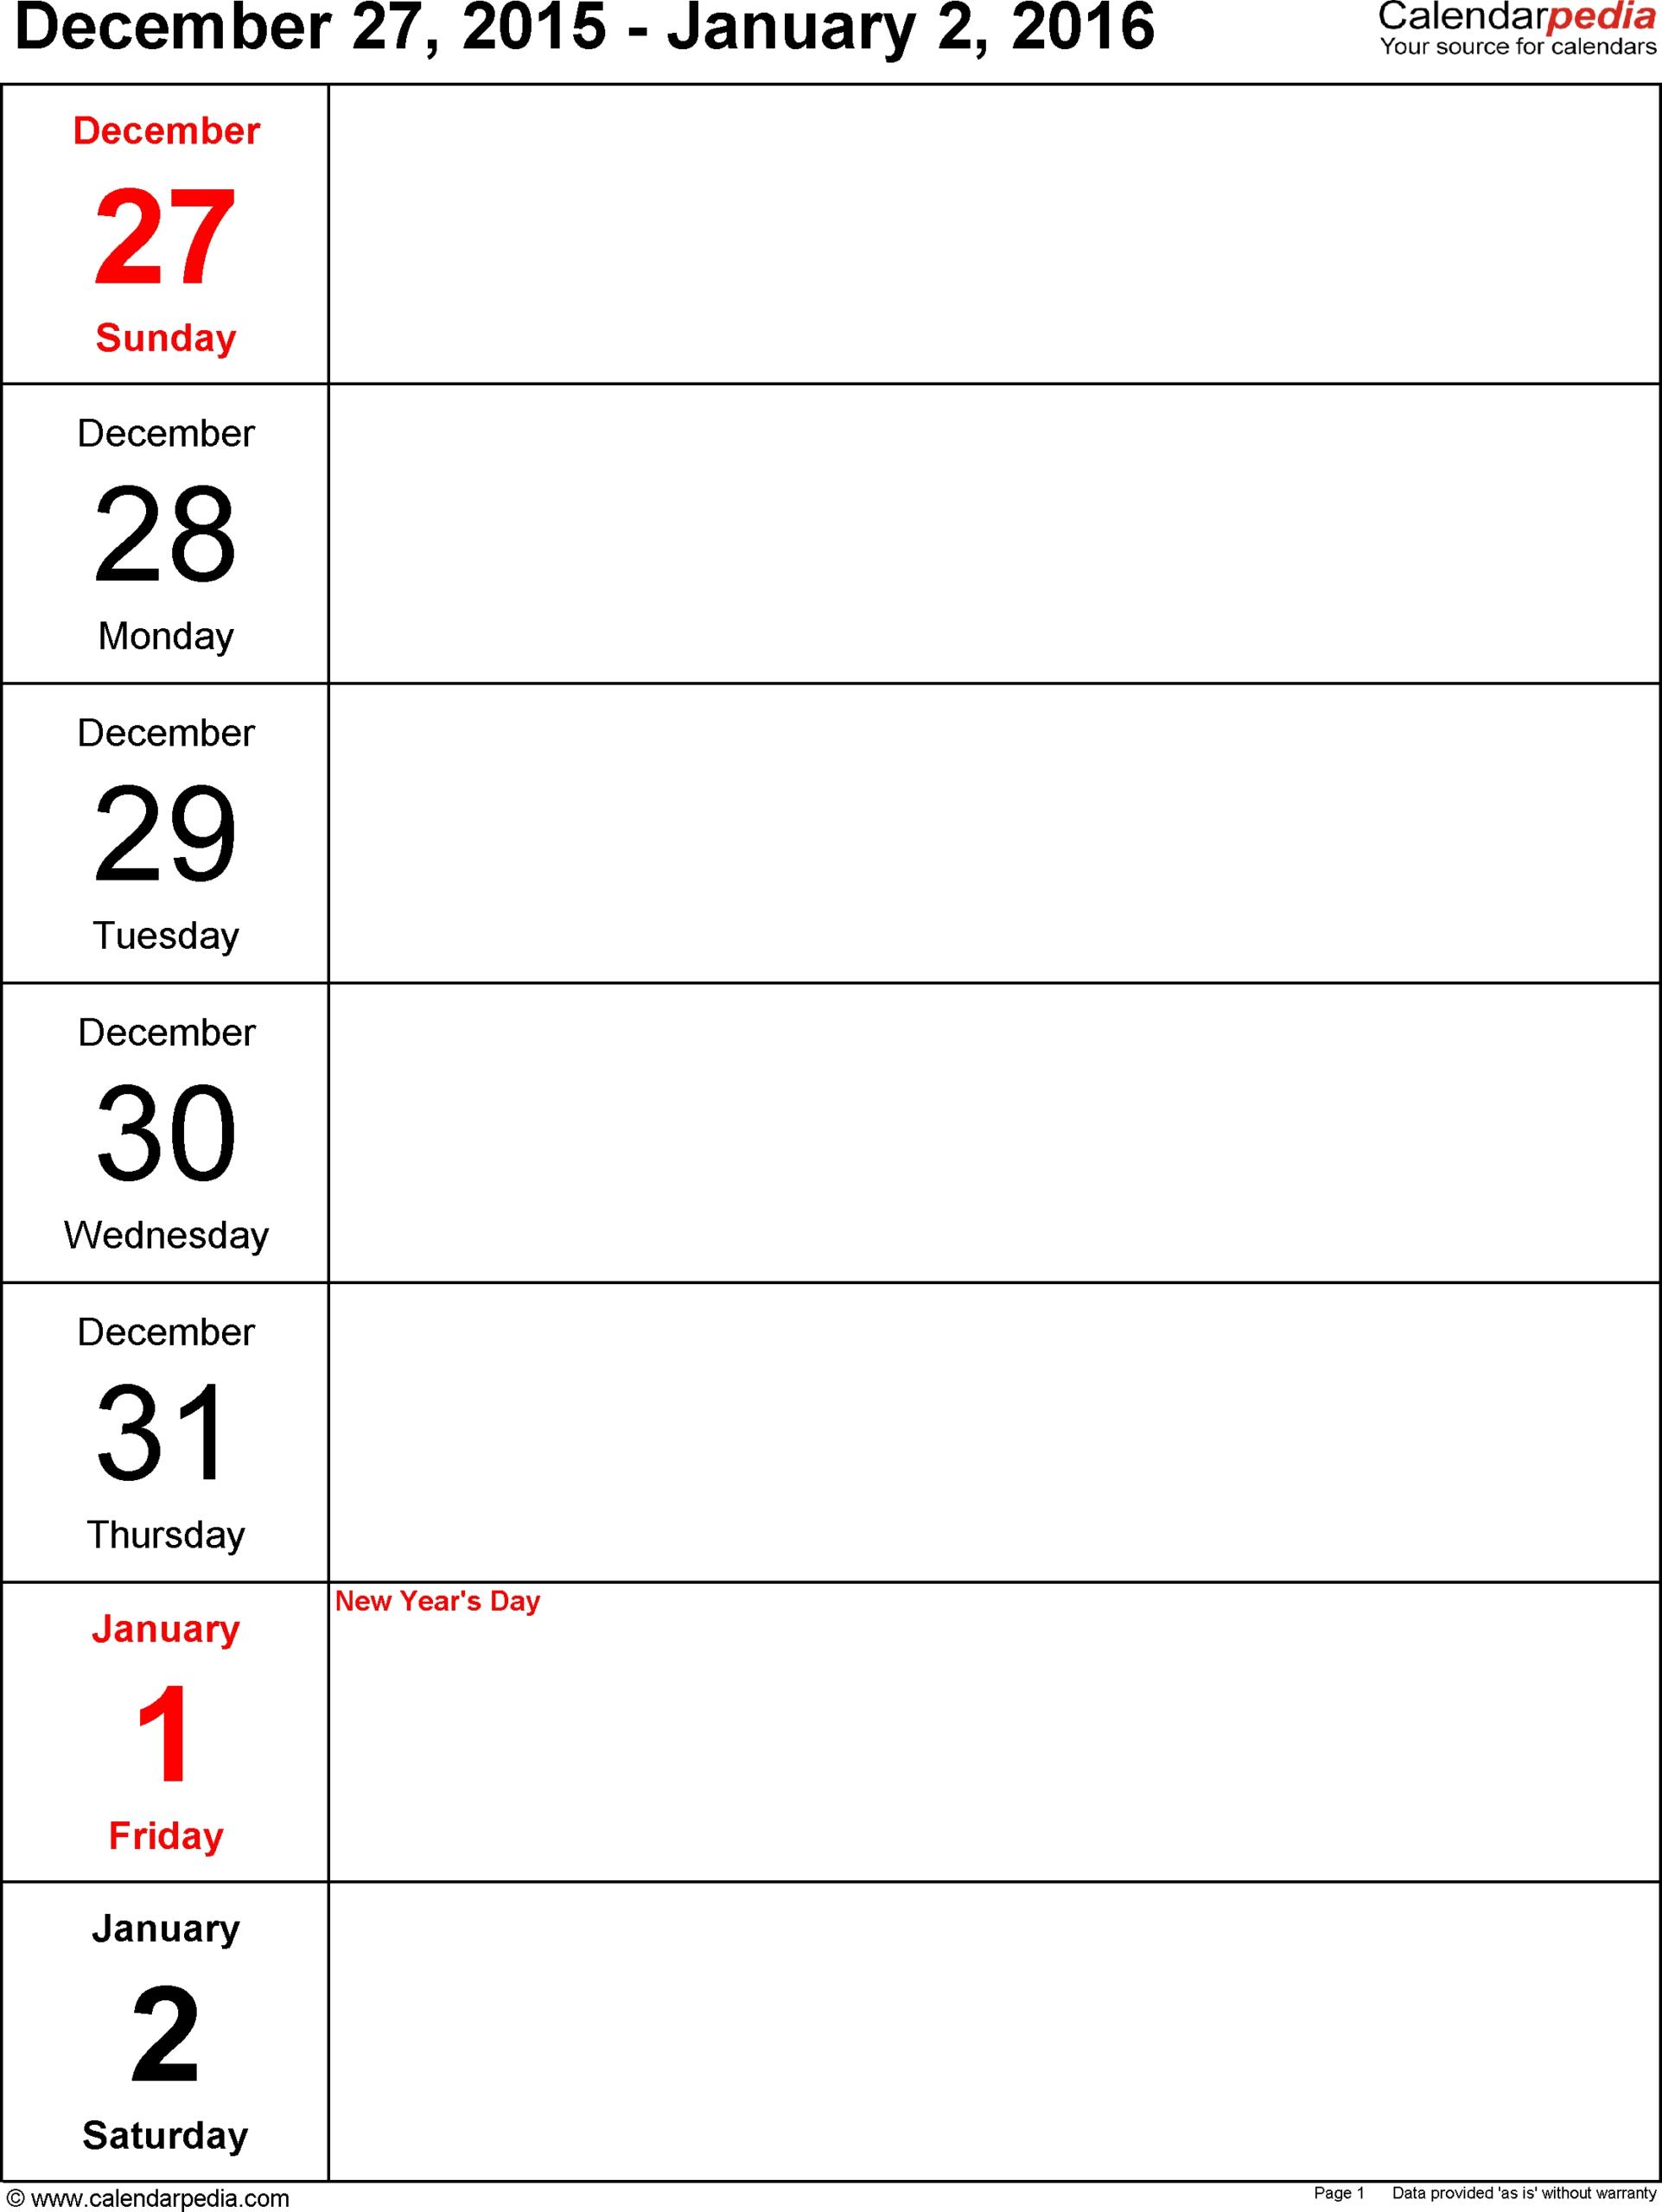 5 Day Calendar Template Word  Calendar Inspiration Design with regard to 5 Day Blank Calendar